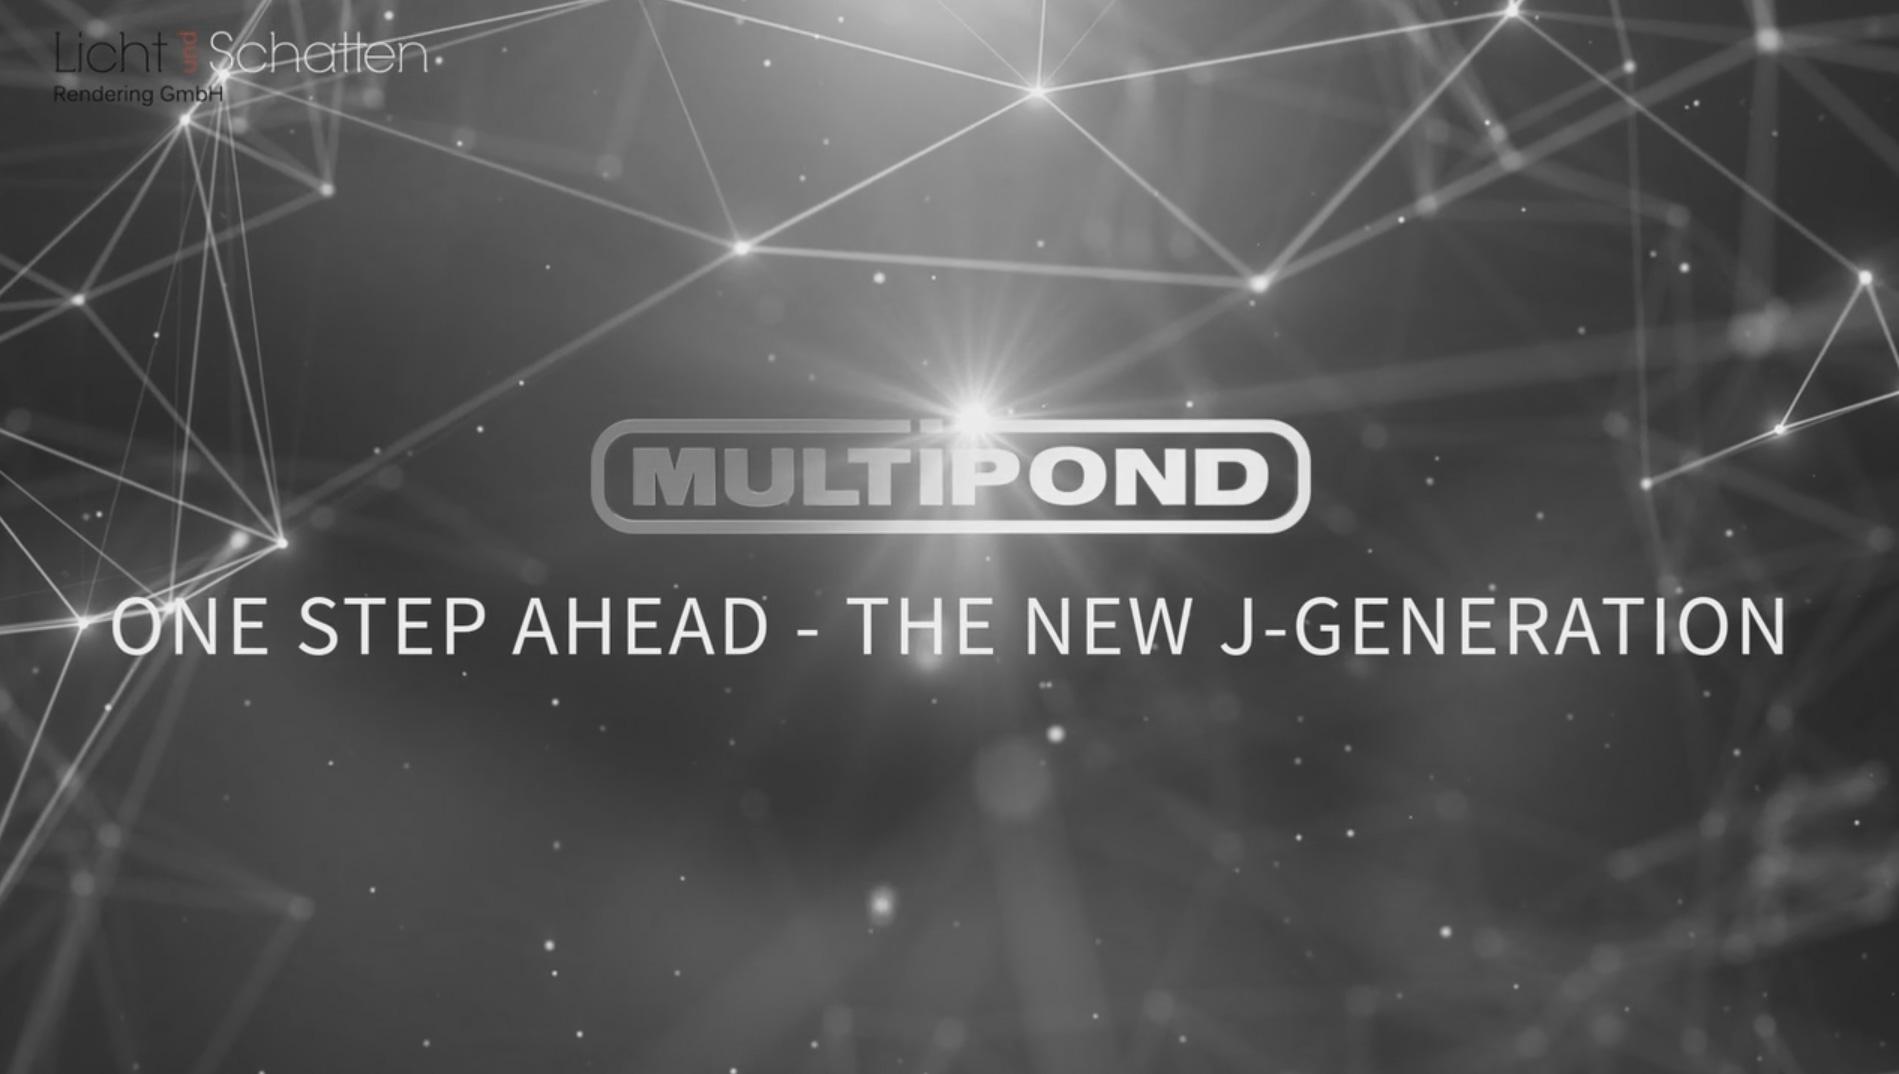 THE-NEW-J-GENERATION Produktvisualisierung